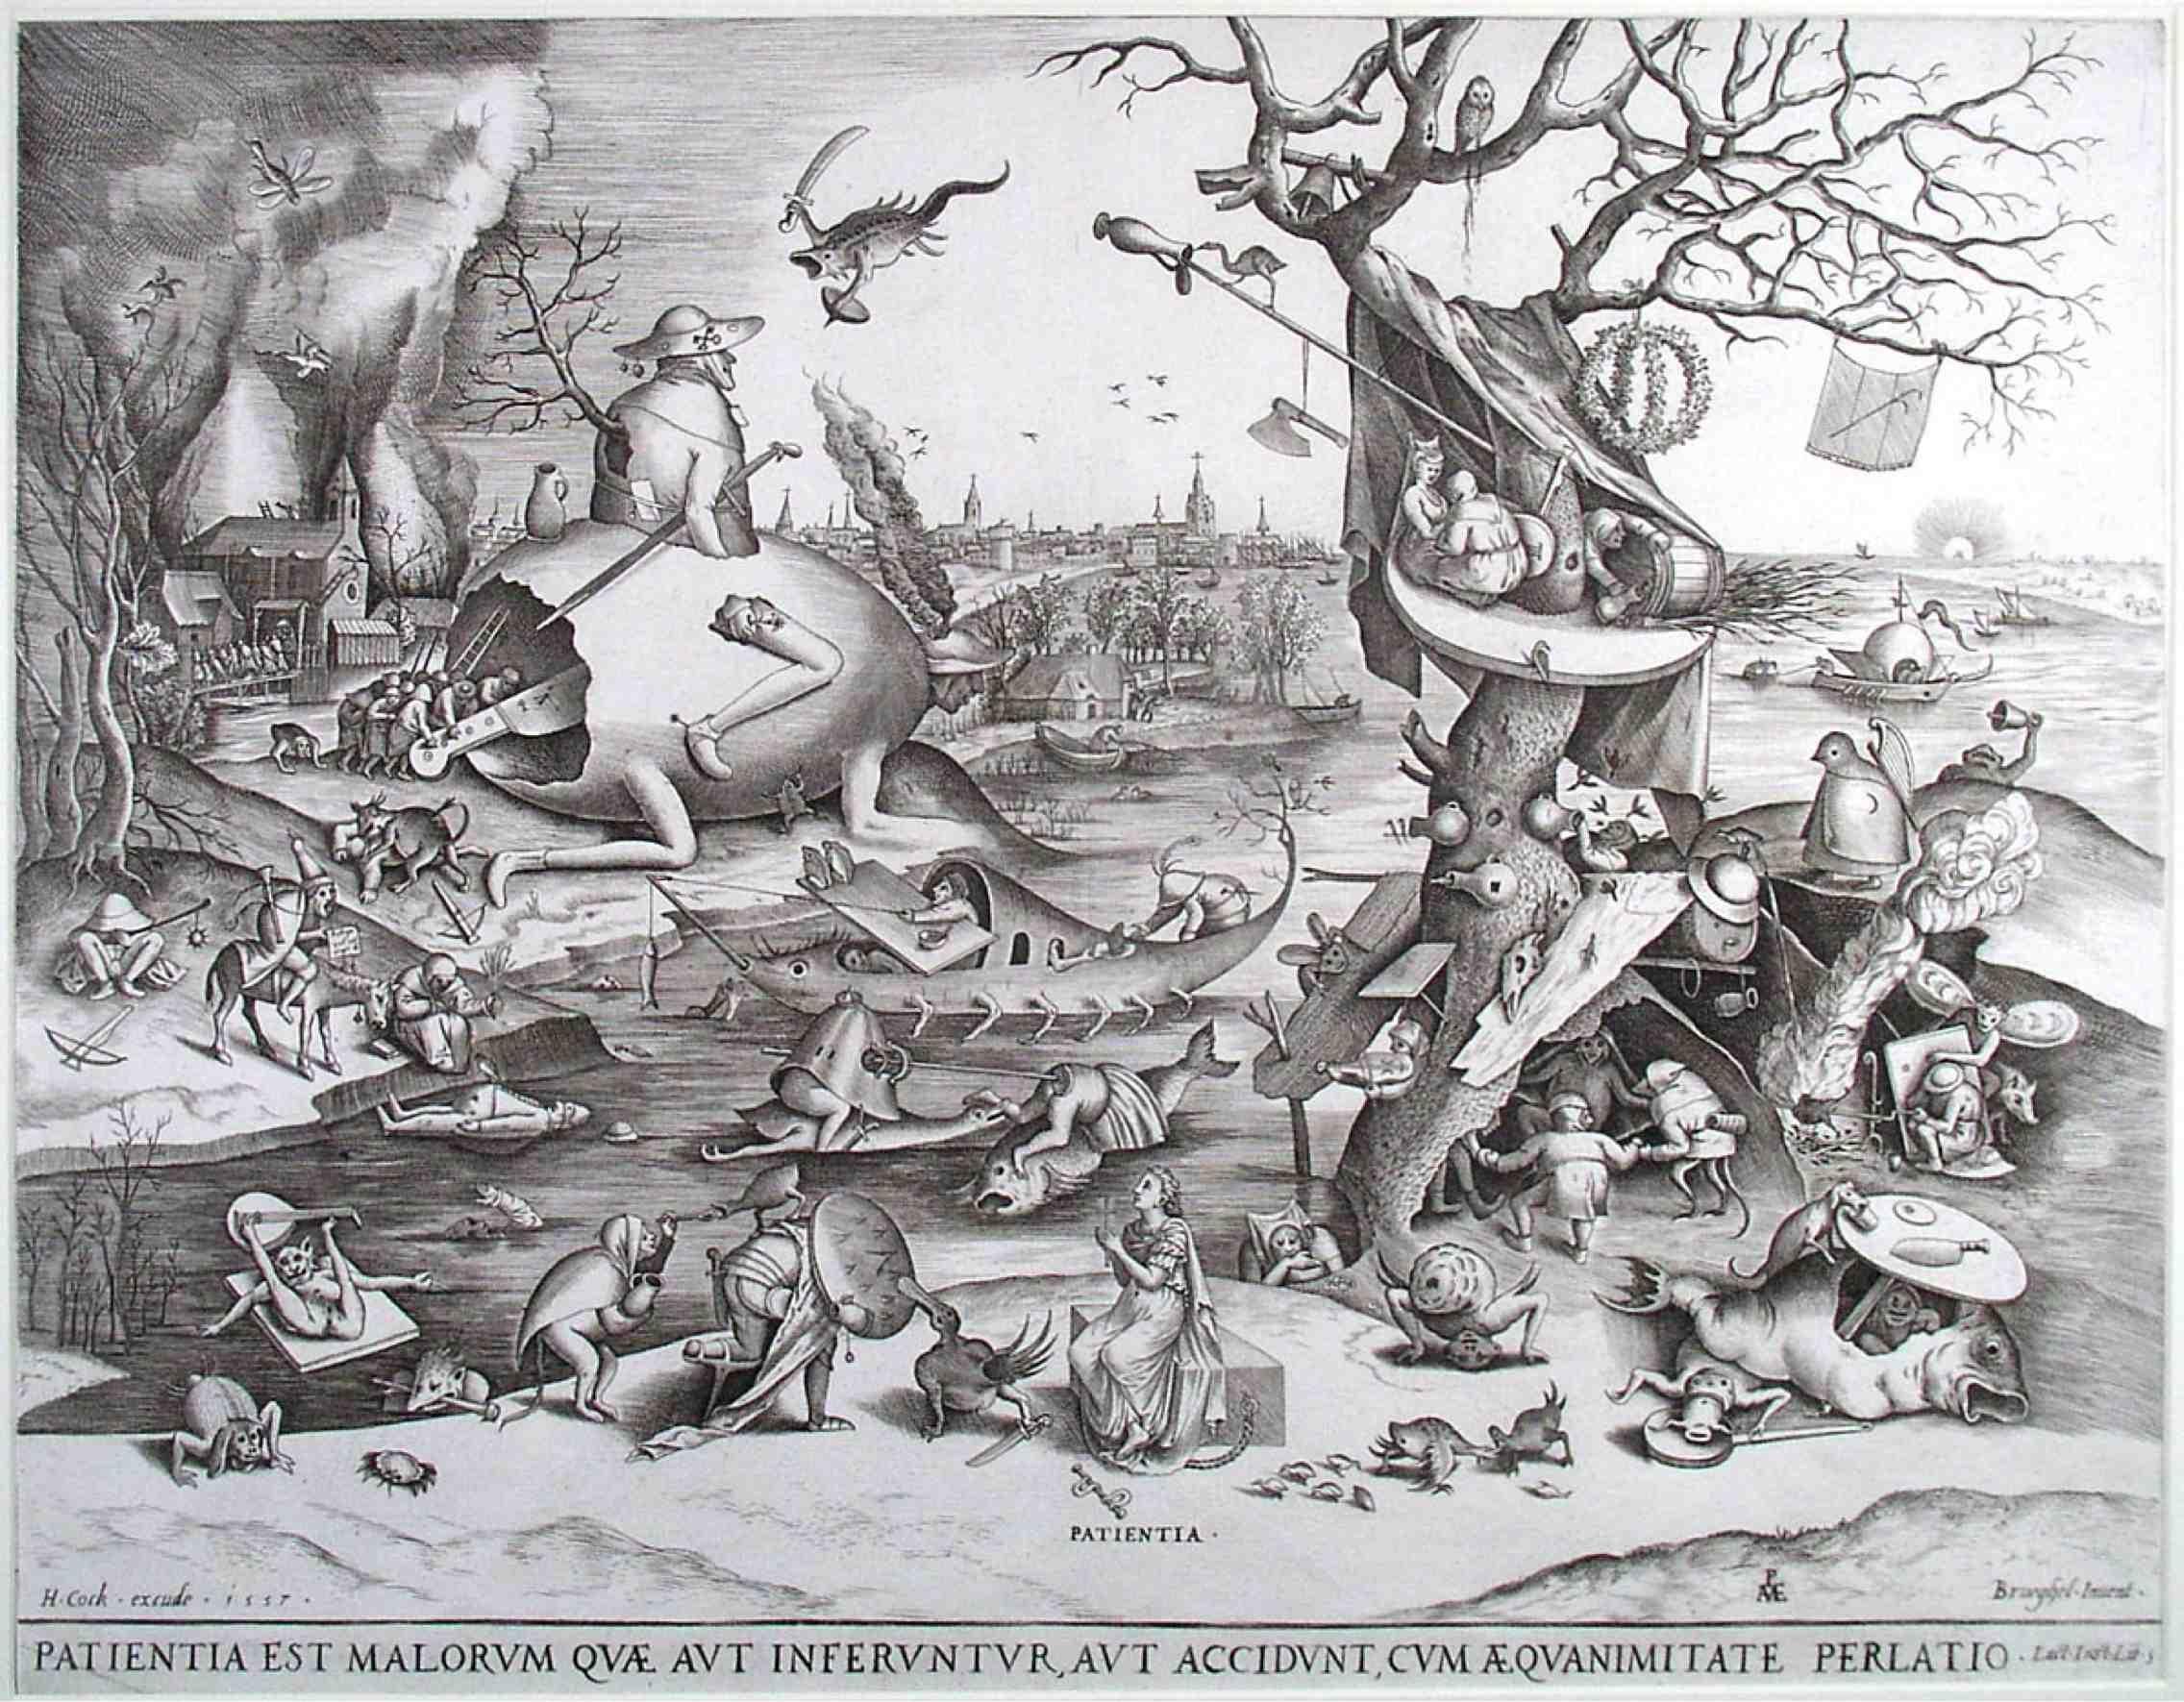 1000+ images about Pieter Bruegel on Pinterest.